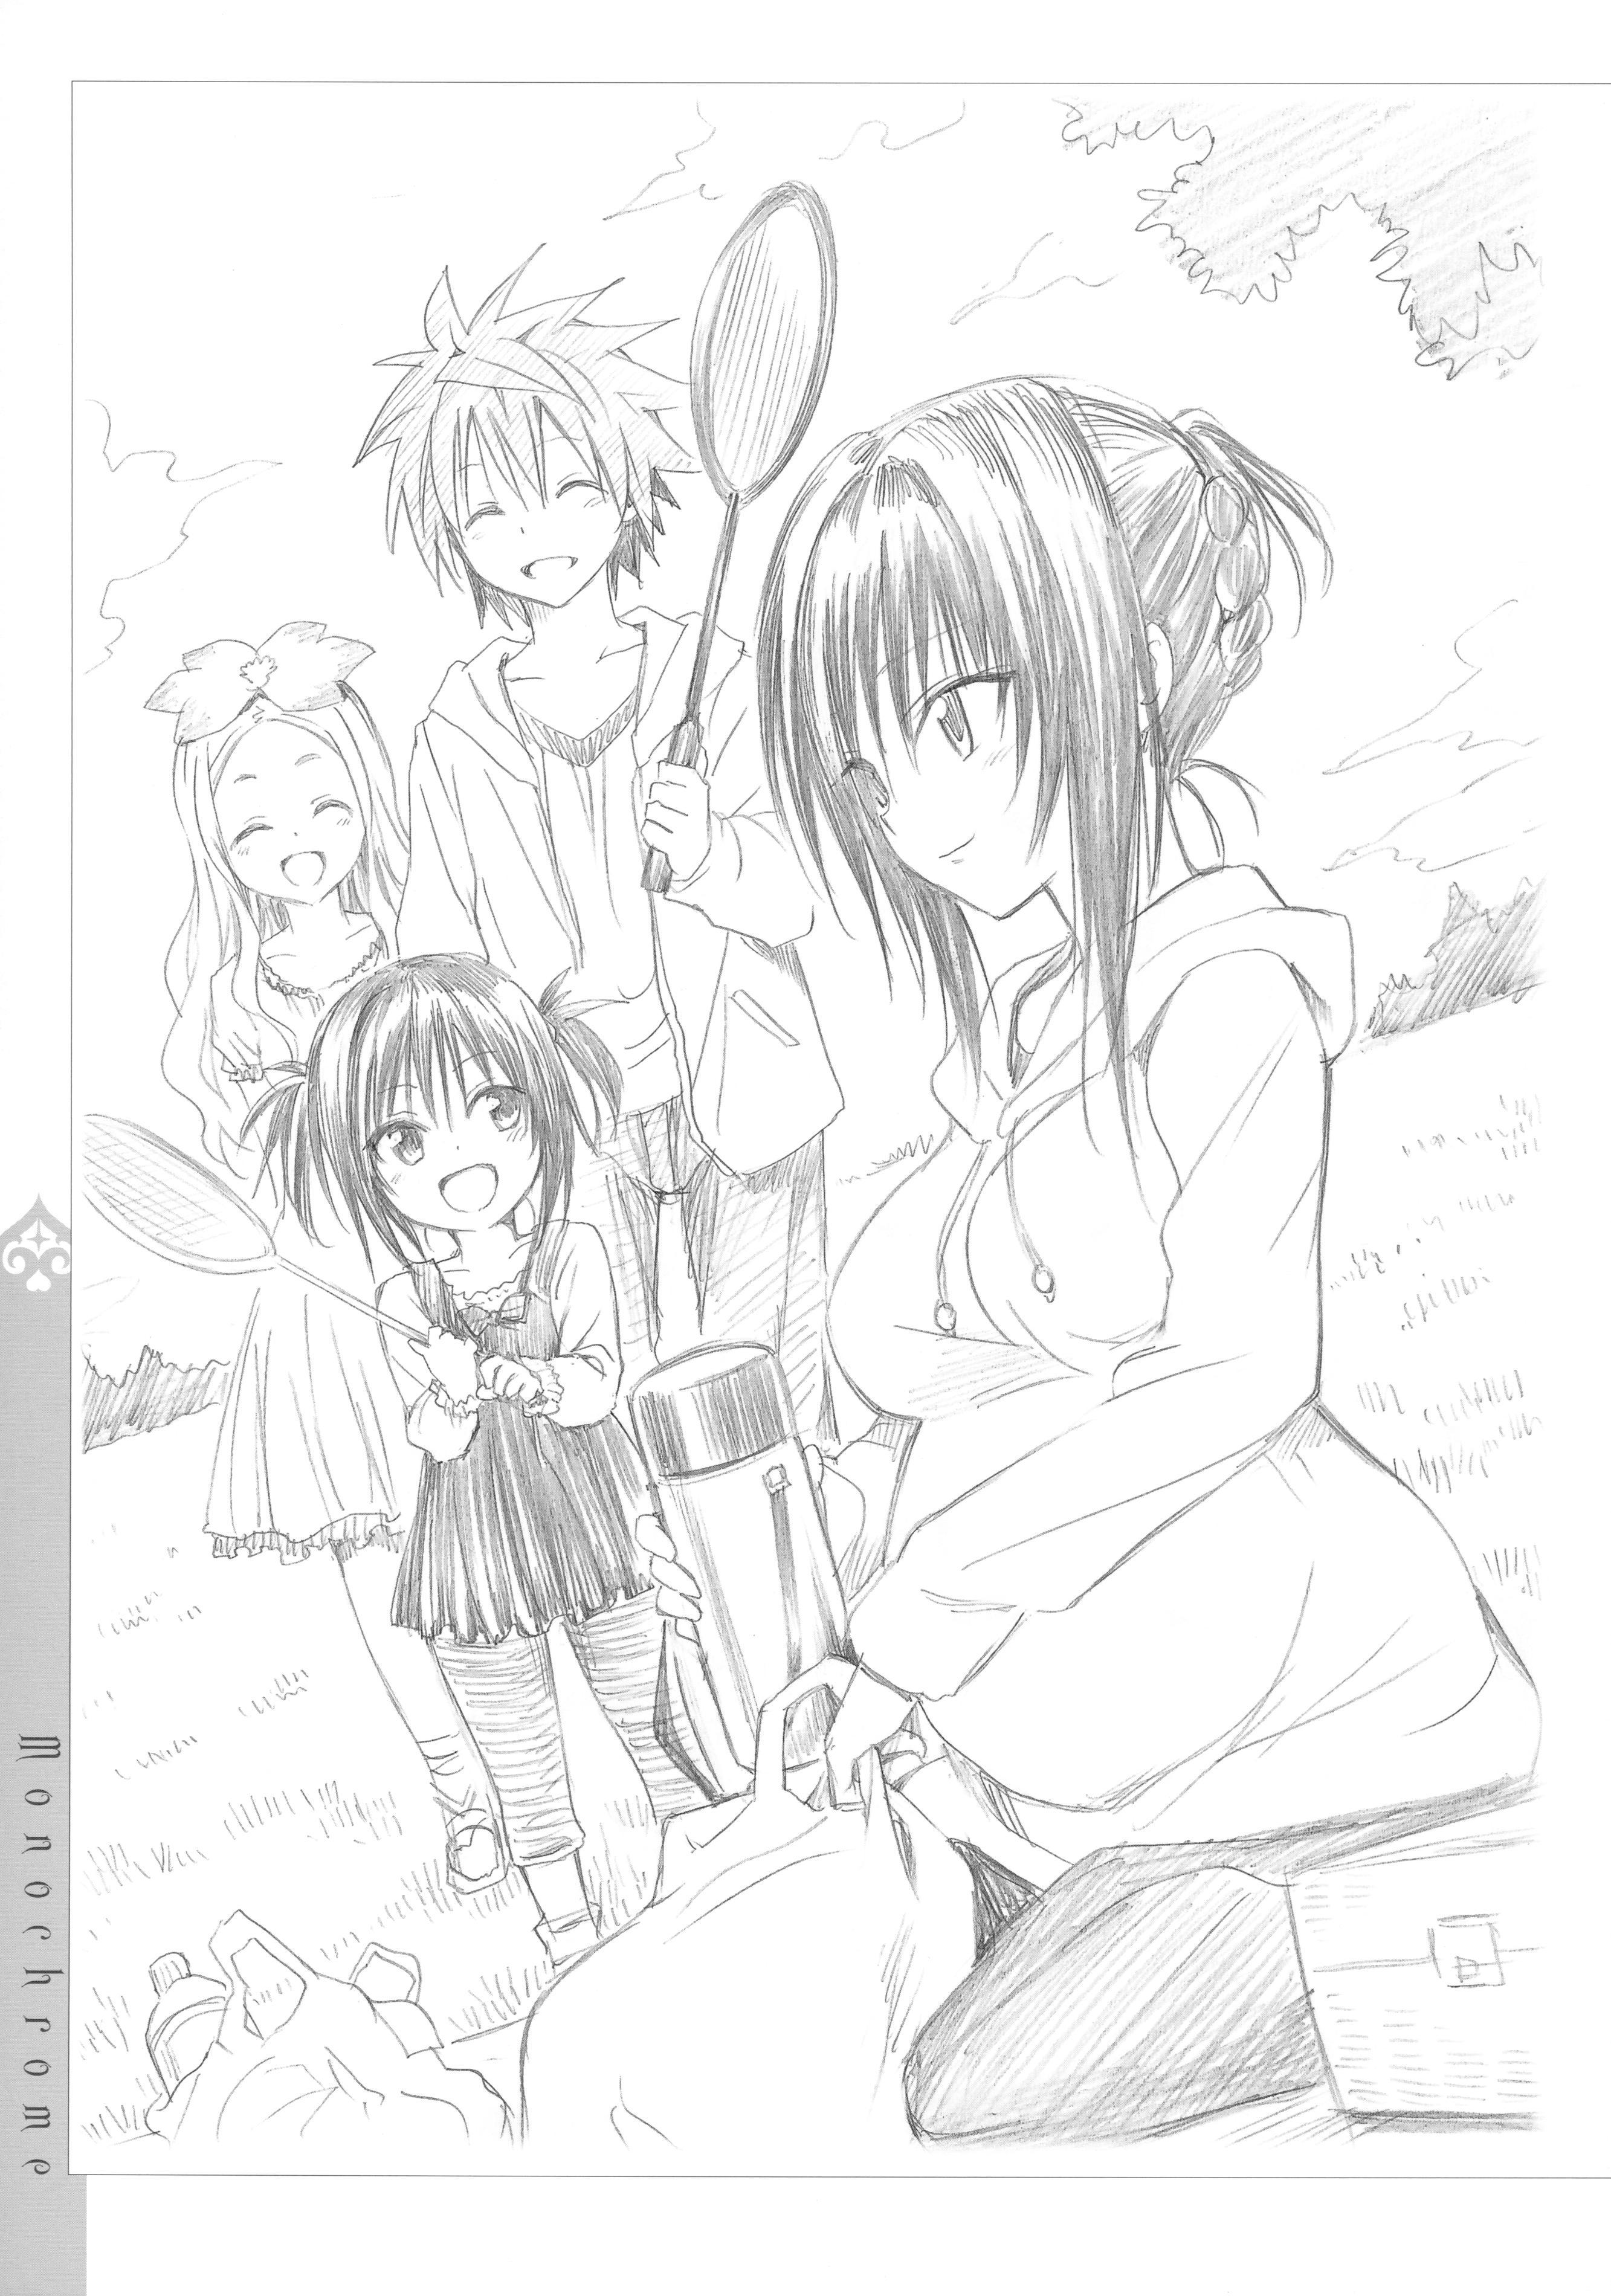 [Yabuki Kentaro] To Love-Ru -Trouble- Darkness Artbook Harem Gold 135